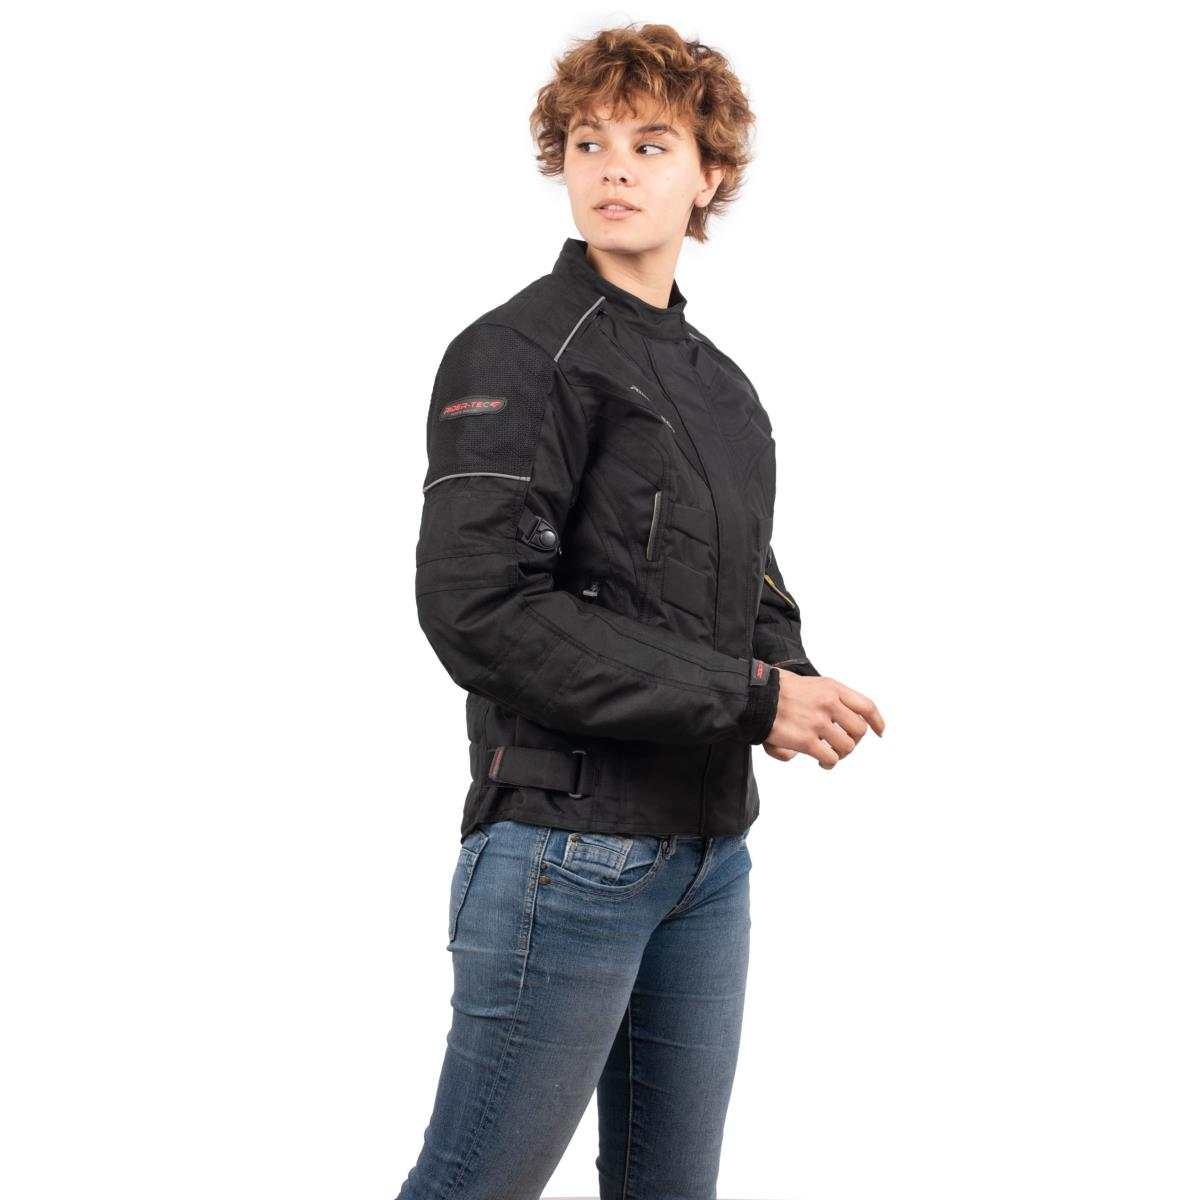 Blouson Moto Femme Urban Lady Rider-Tec Textile Noir